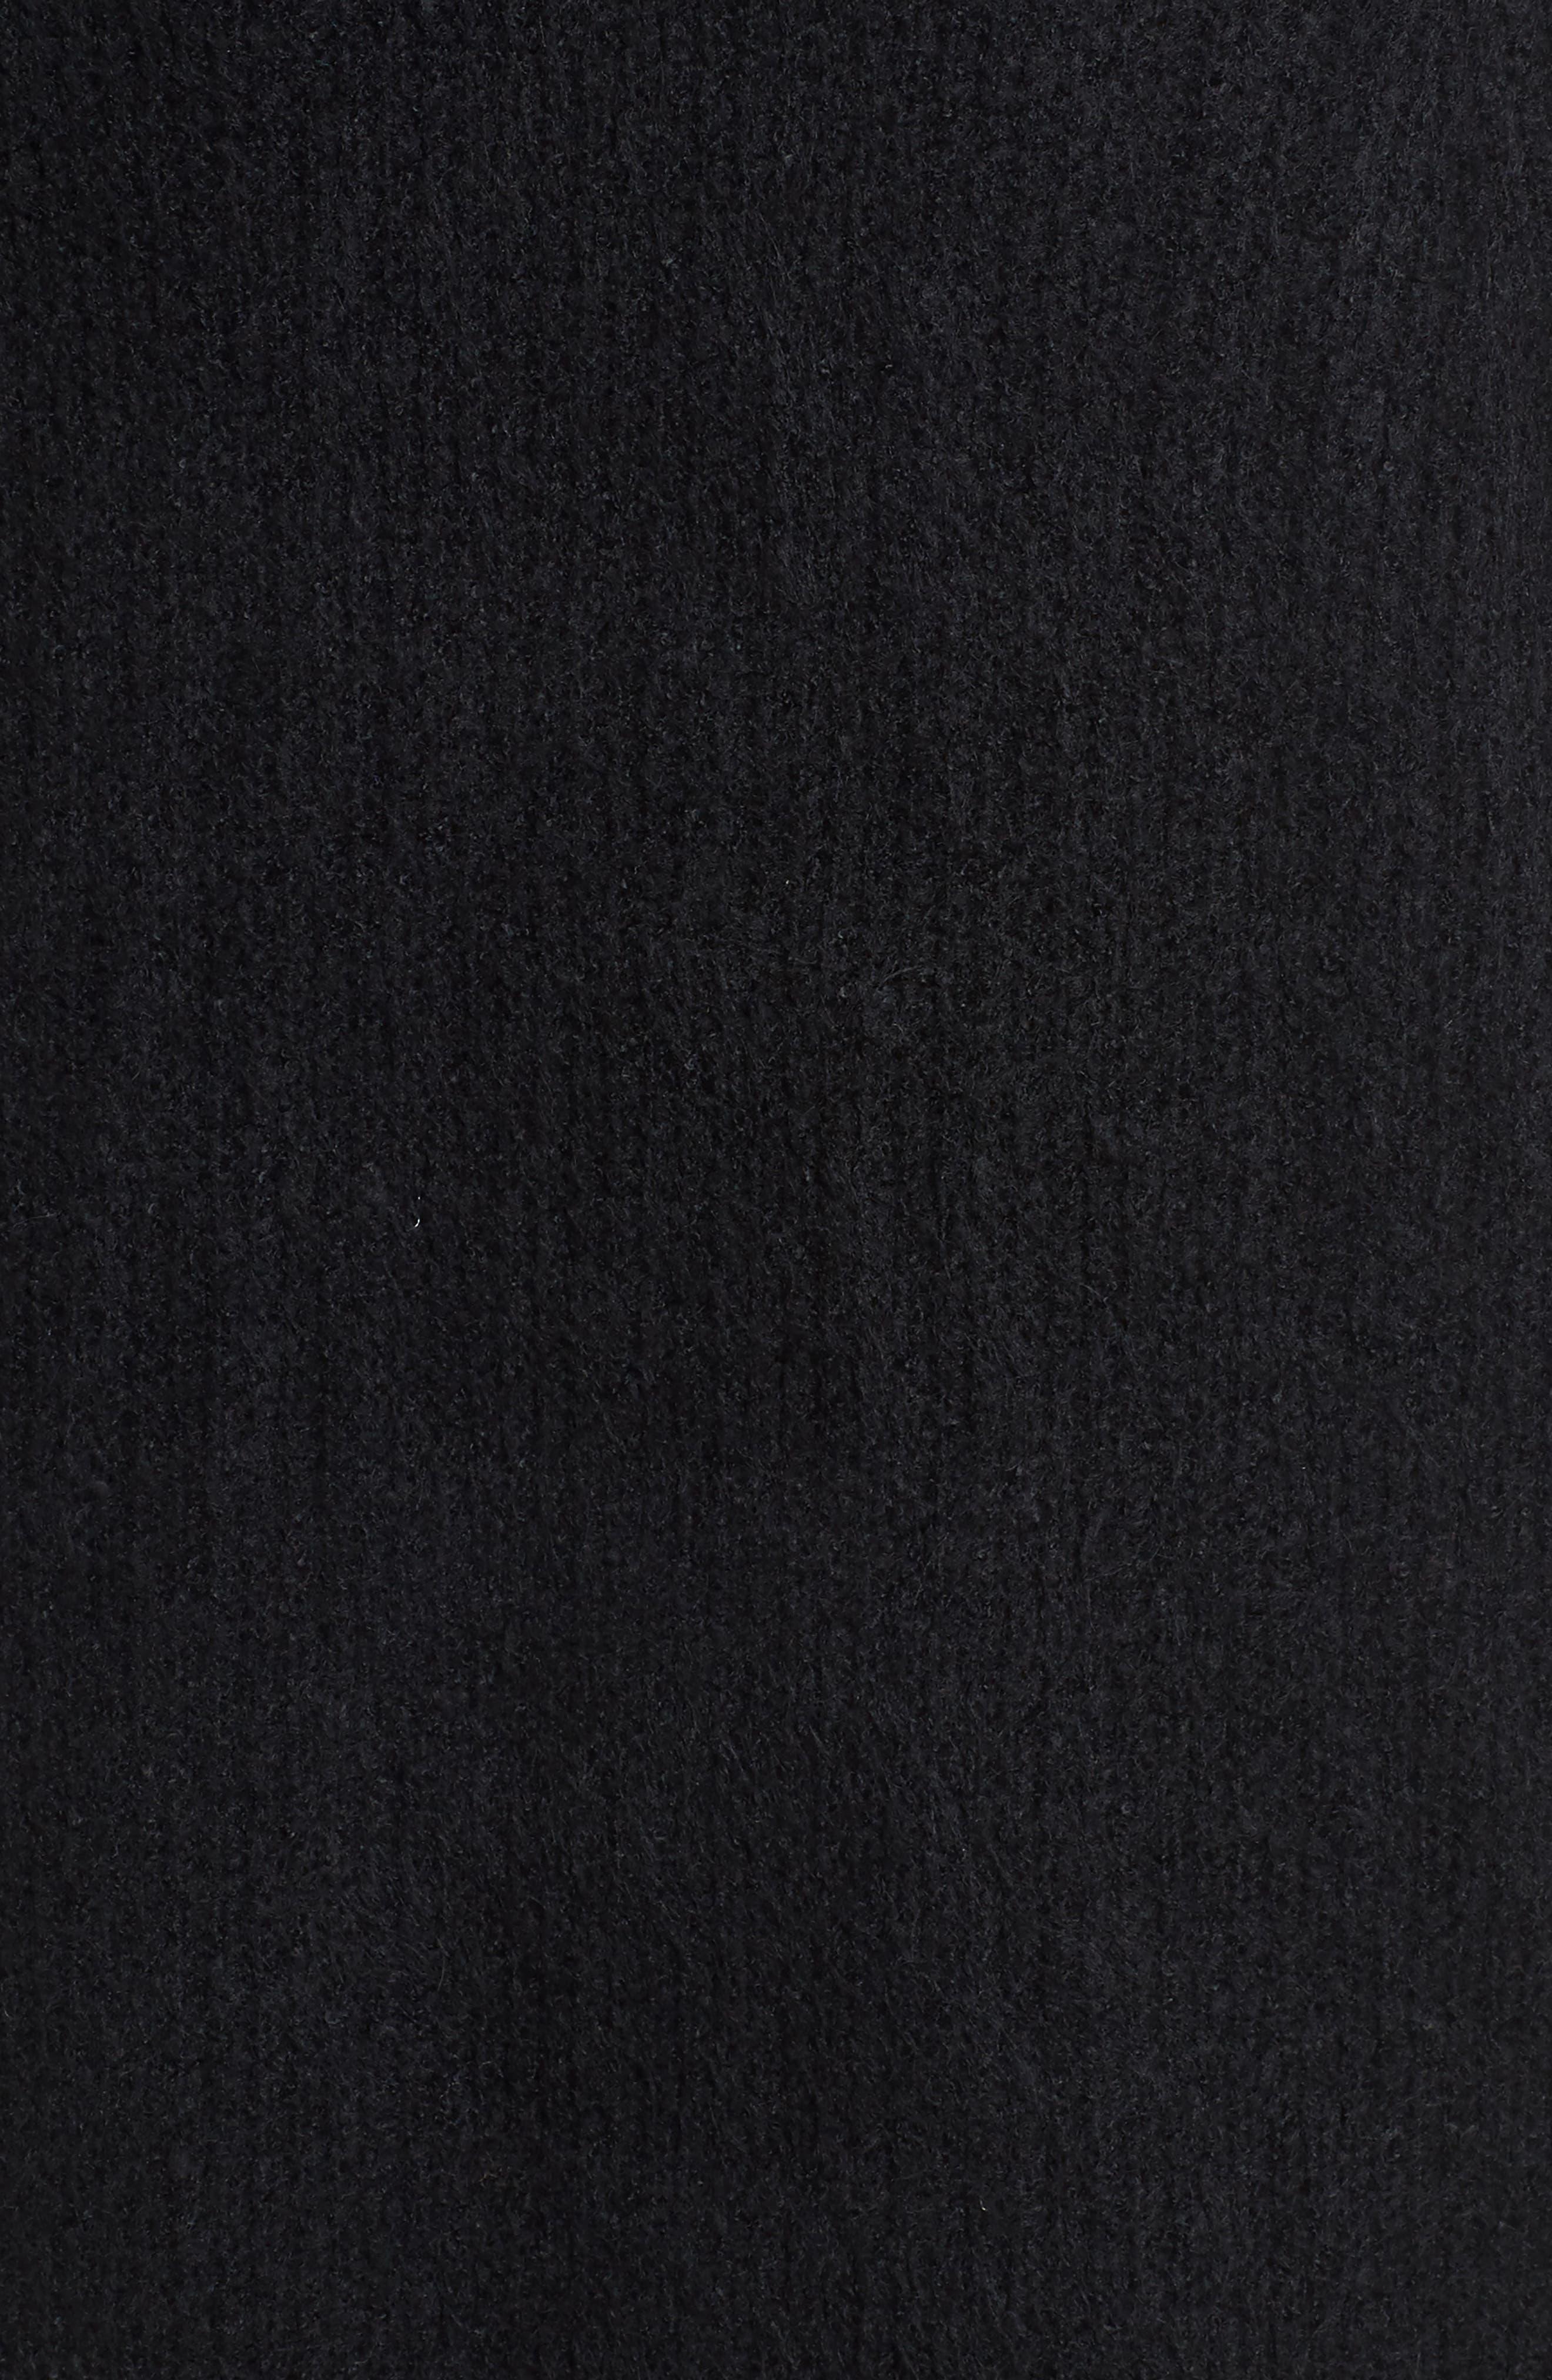 Blouson Sleeve Cardigan,                             Alternate thumbnail 5, color,                             001